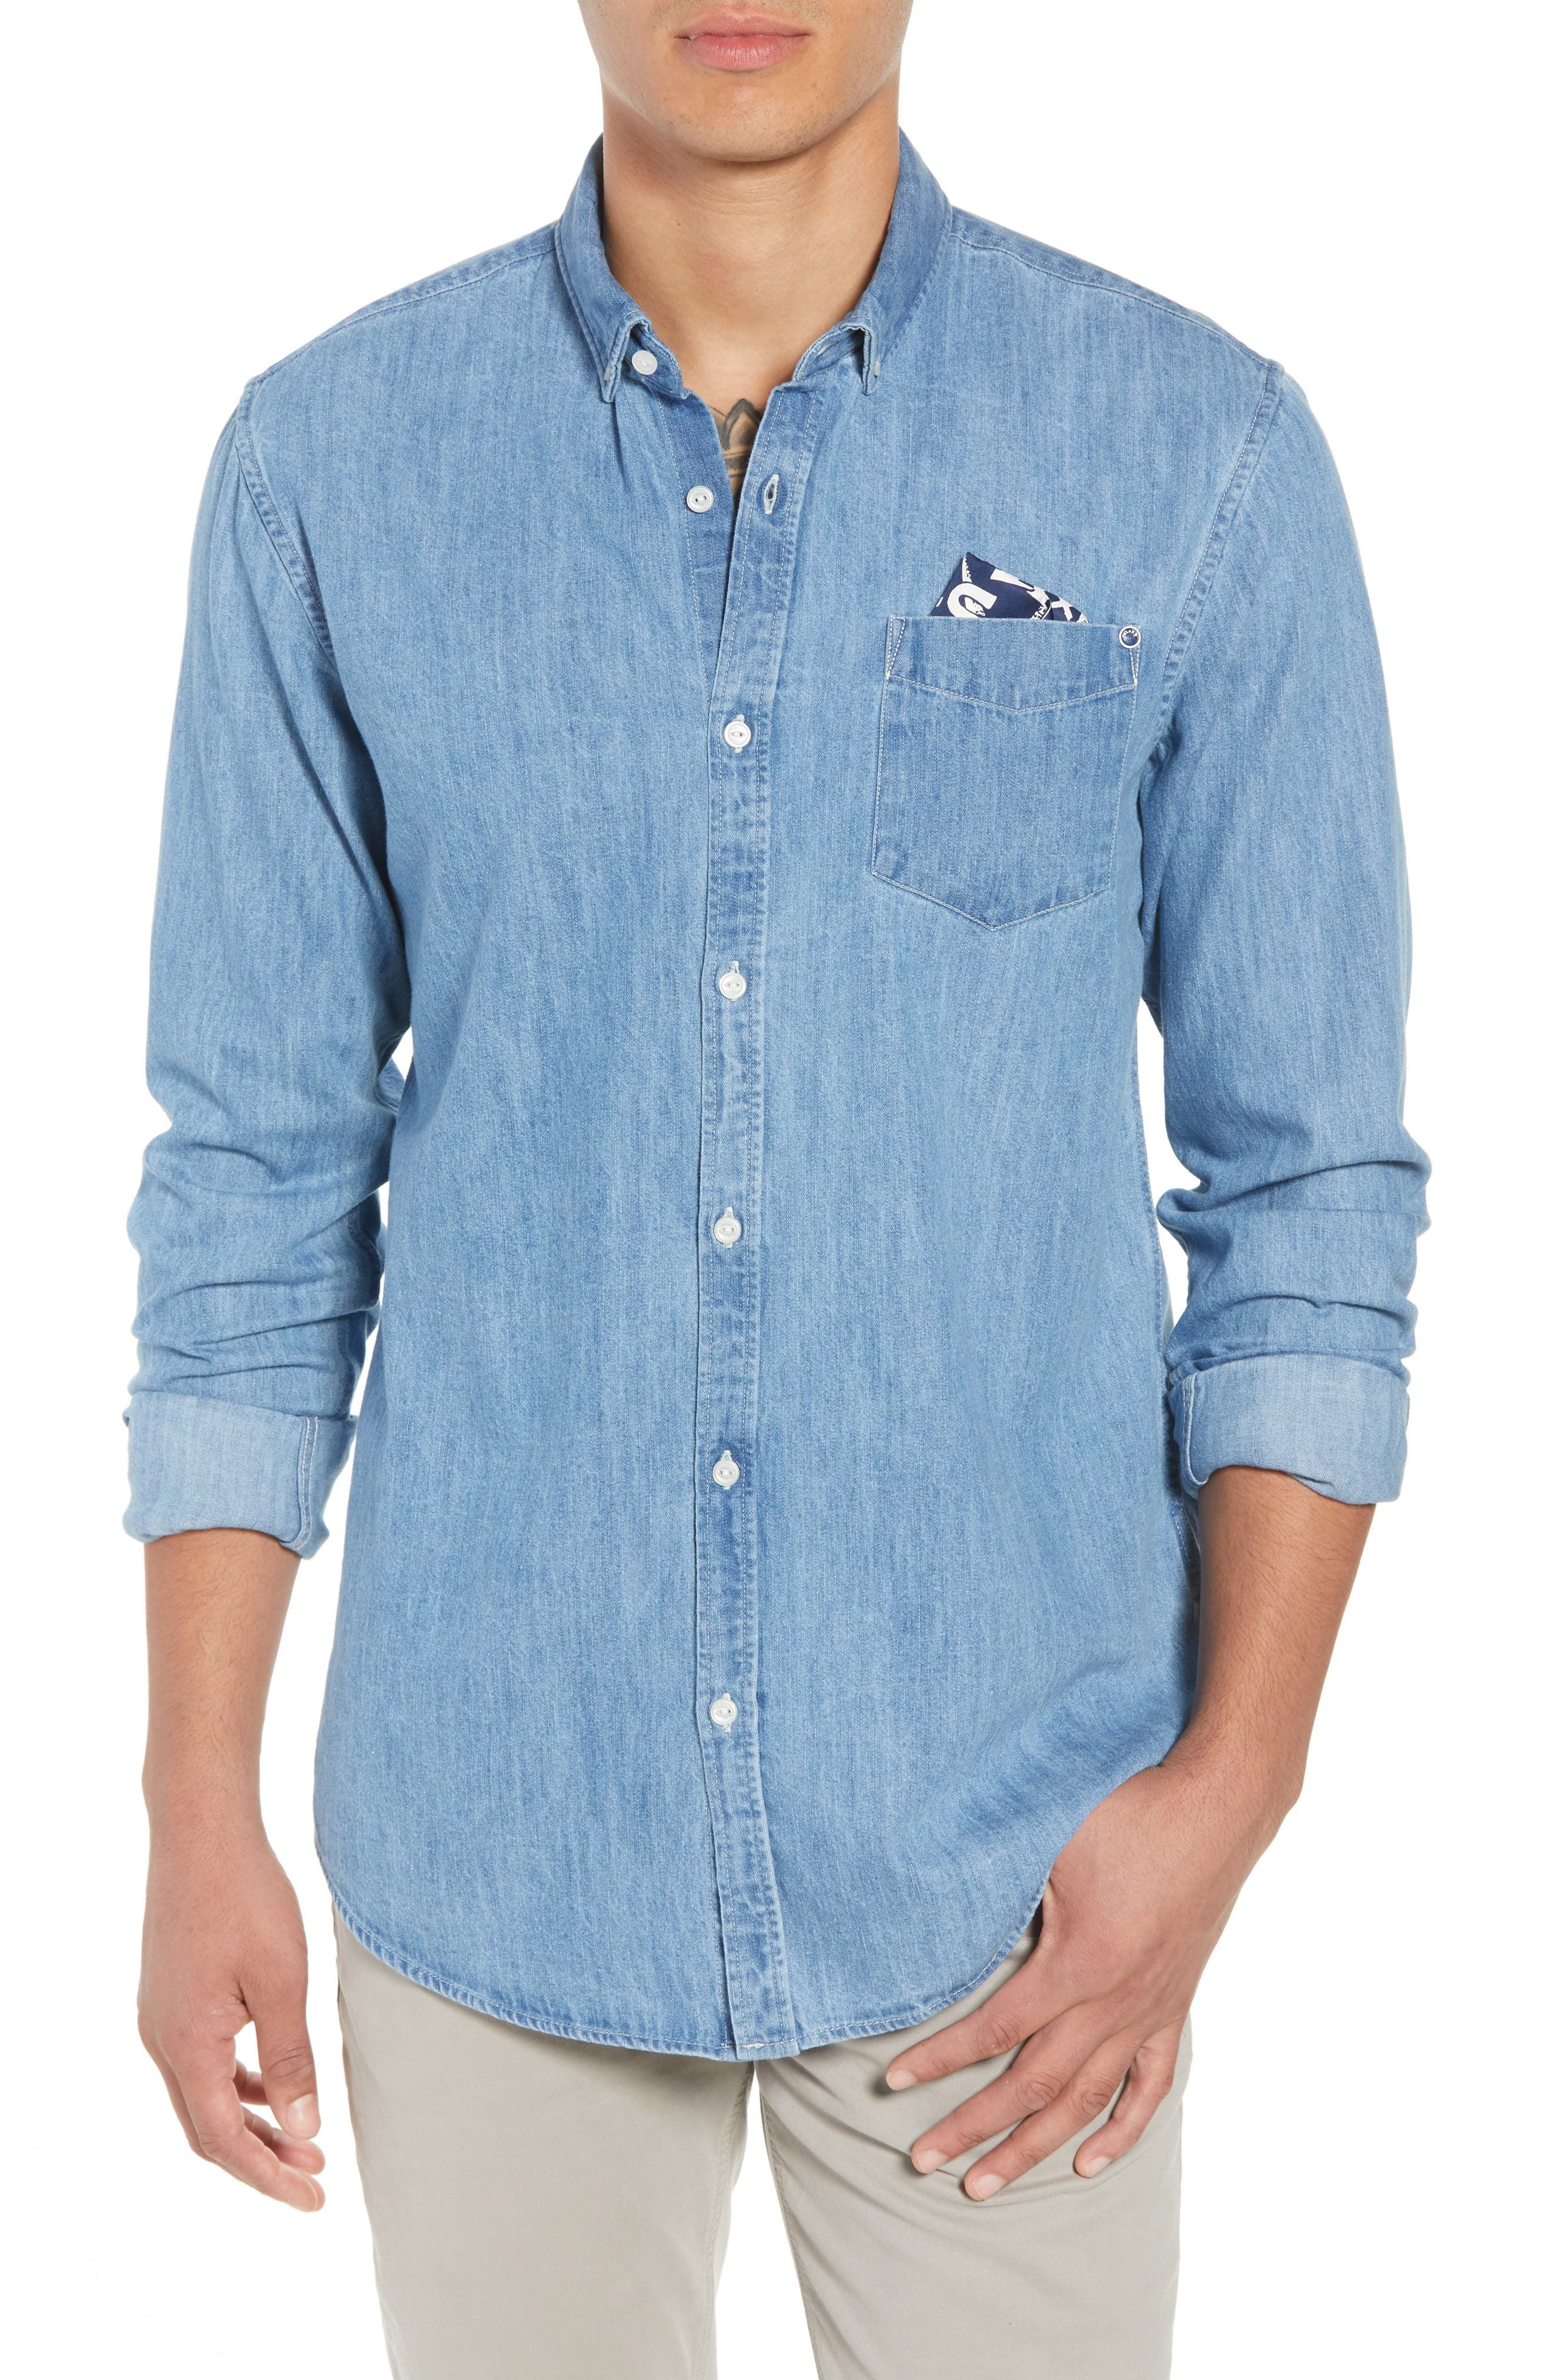 Amsterdams Blauw Pocket Square Chambray Sport Shirt,                         Main,                         color, DENIM BLUE